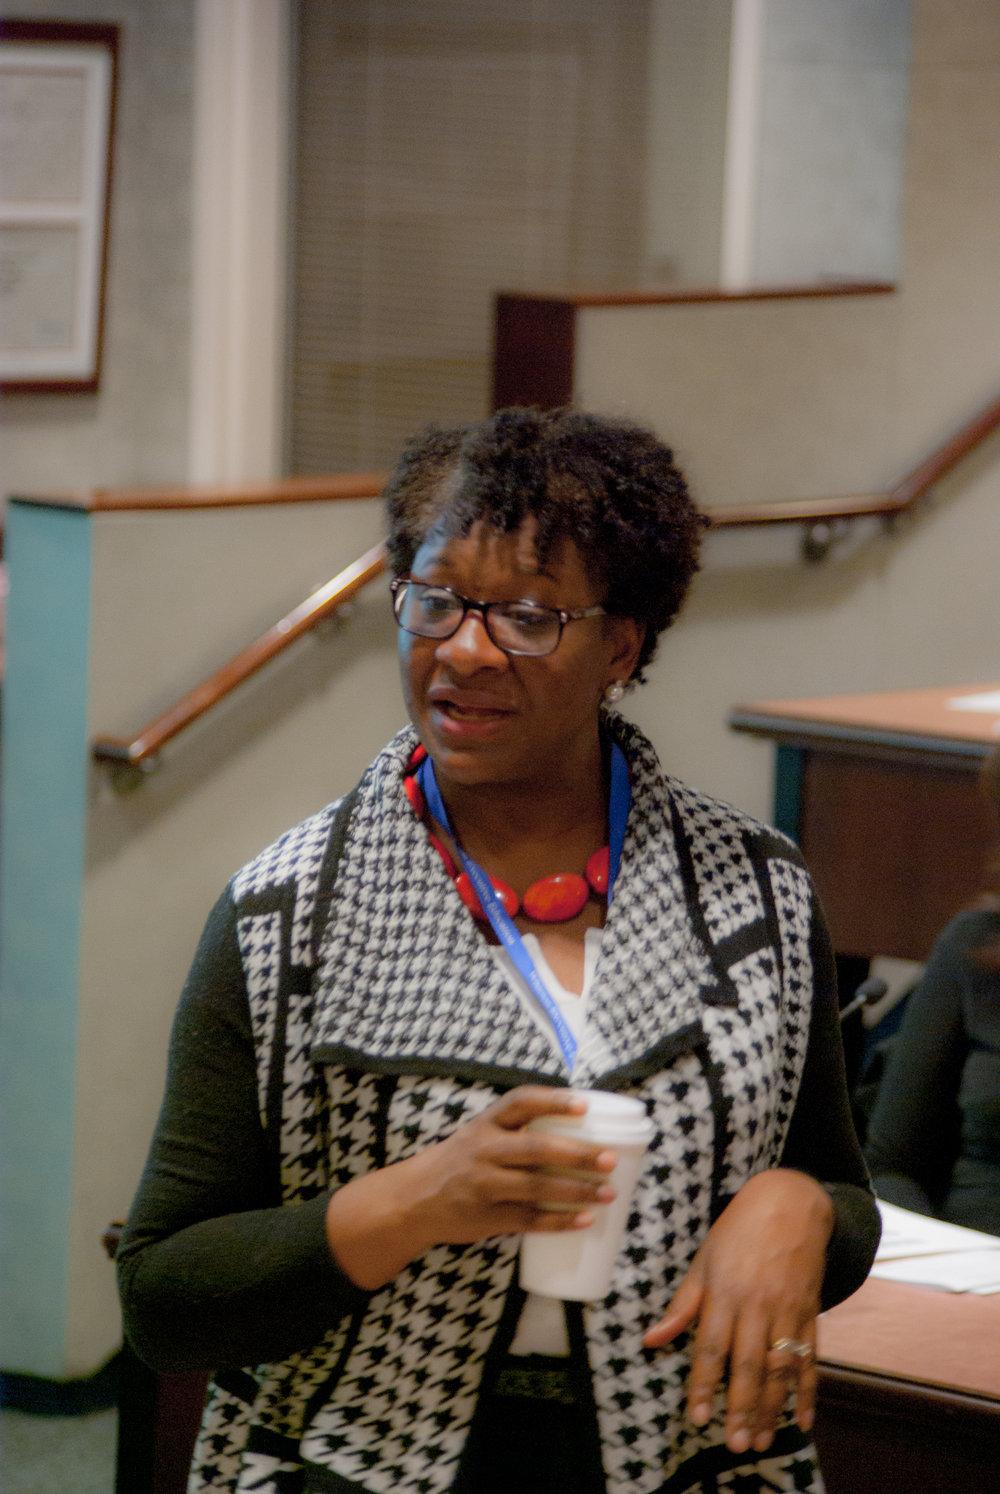 Keynote speaker: professor kathy Phillips,  columbia business school (management)